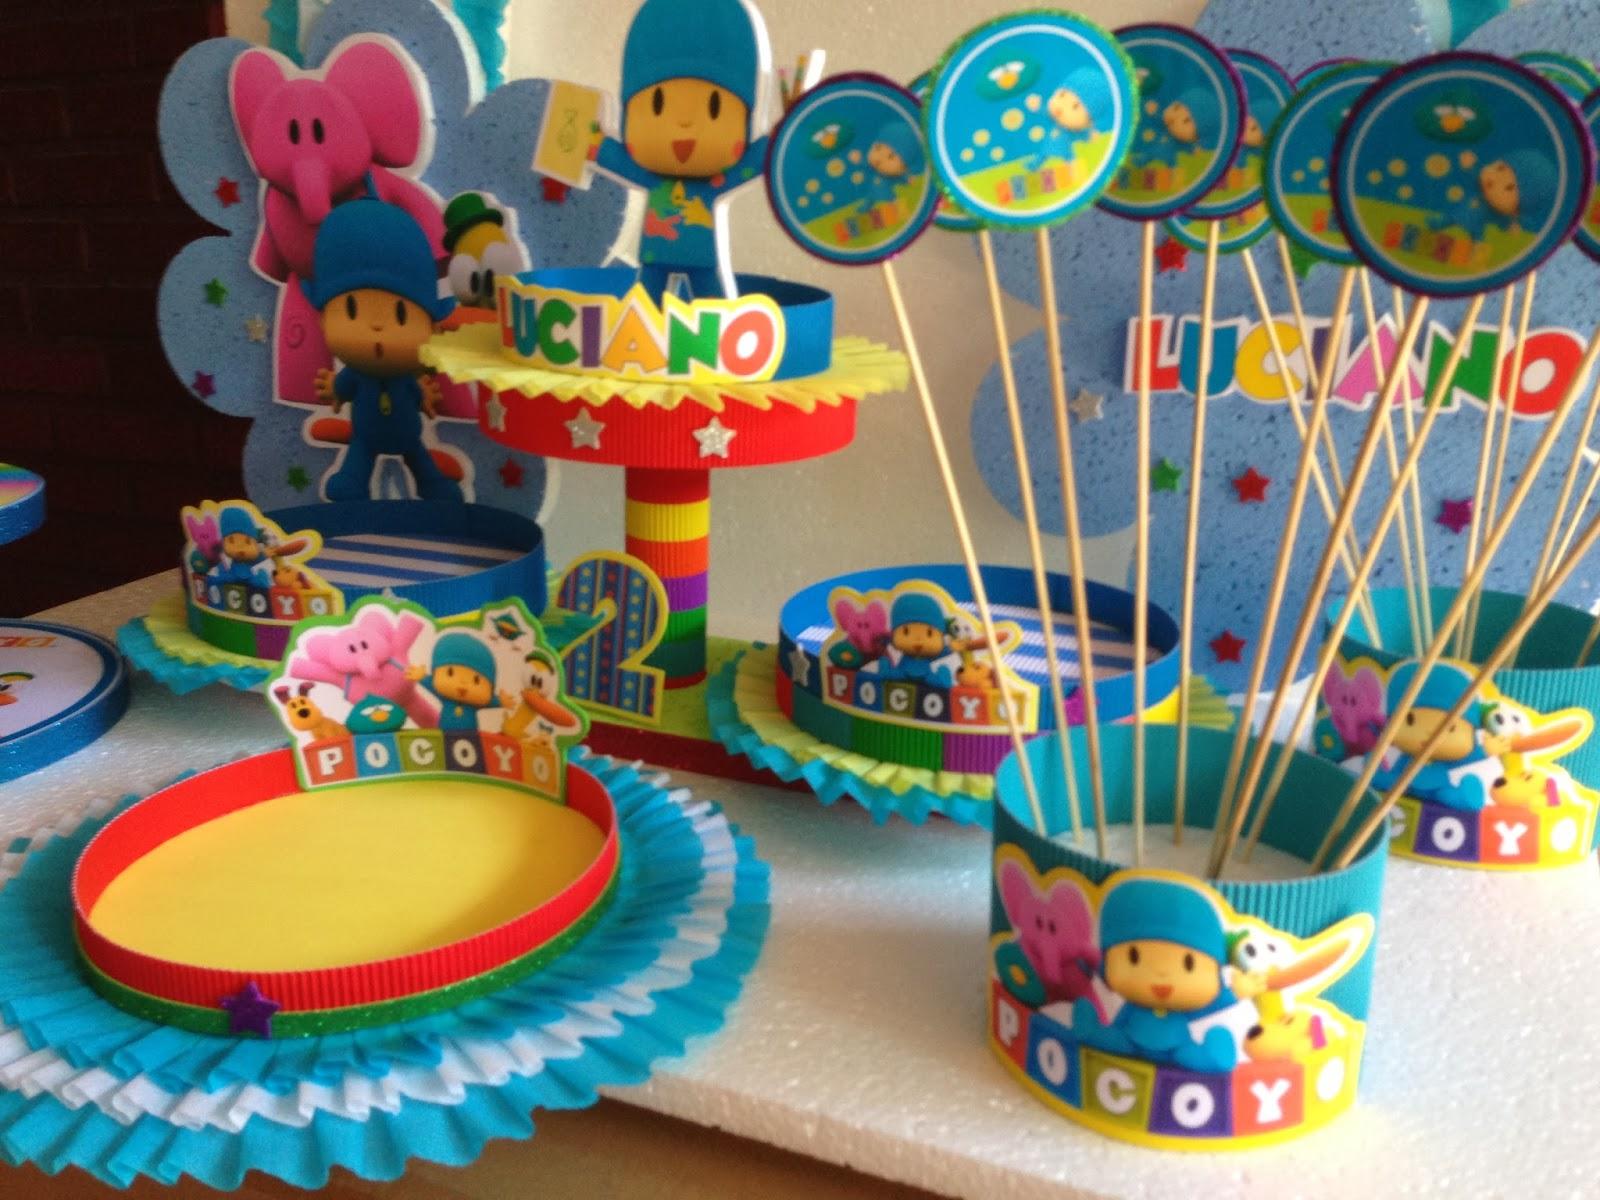 Decoraciones infantiles pocoyo - Decoracion de mesa de cumpleanos infantil ...